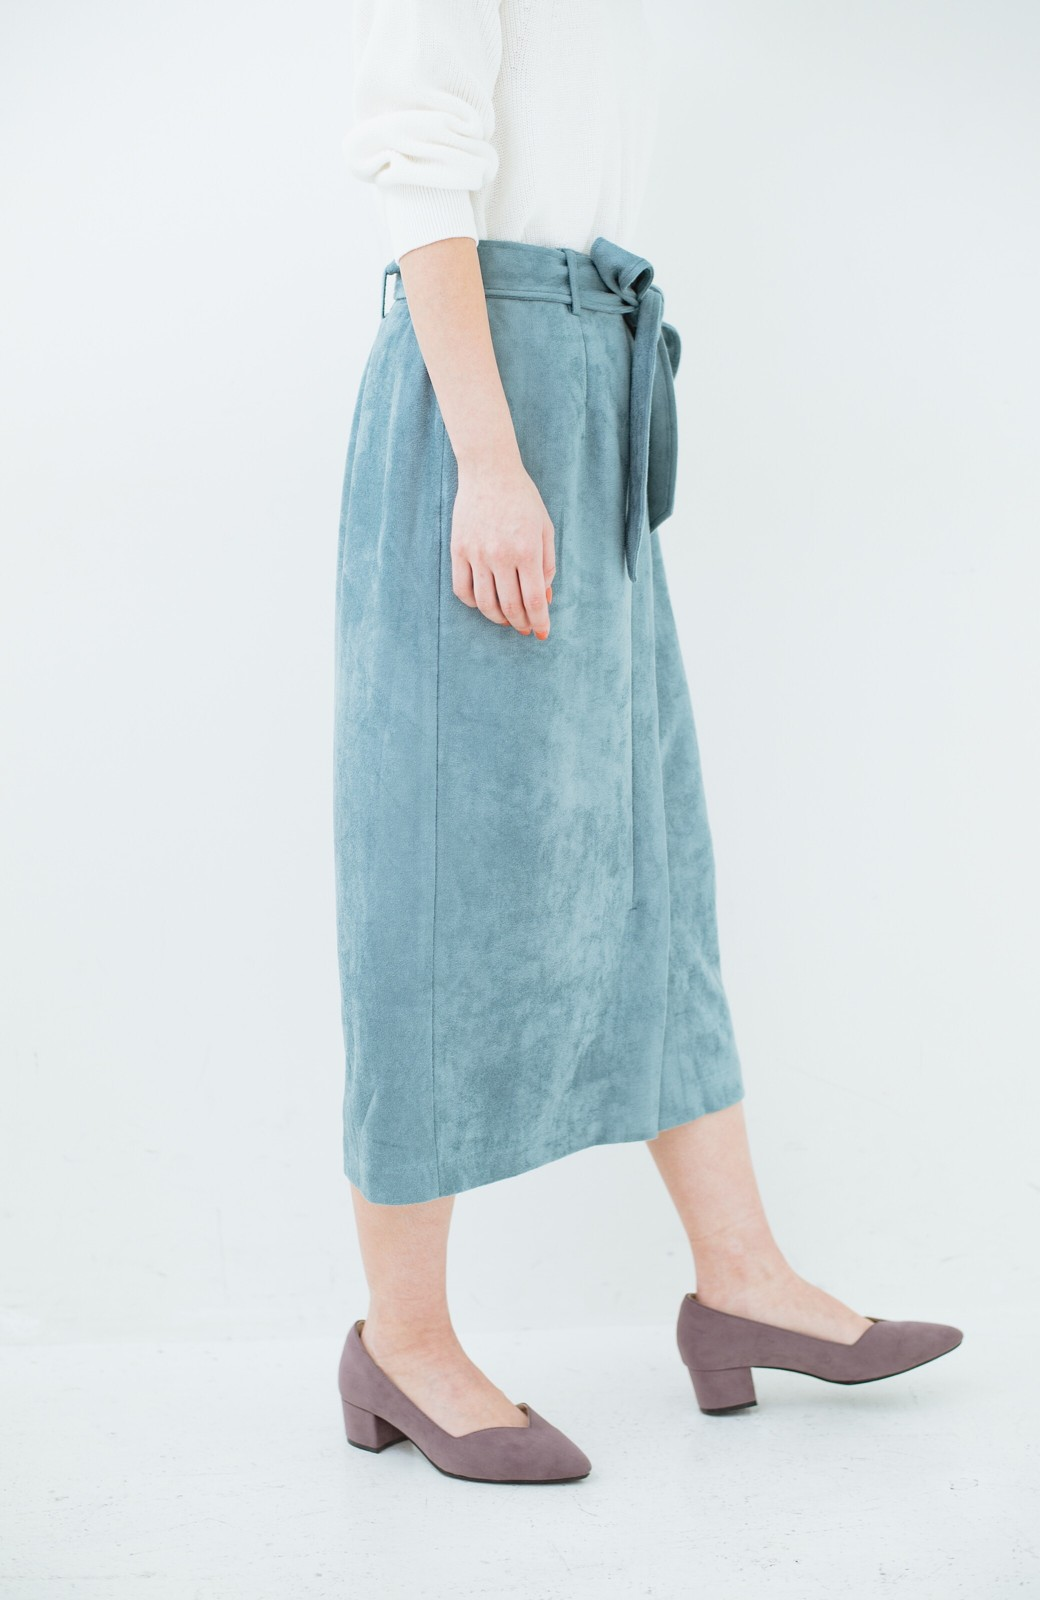 haco! 大人が安心して着られるタイトスカート by que made me <グレイッシュブルー>の商品写真4